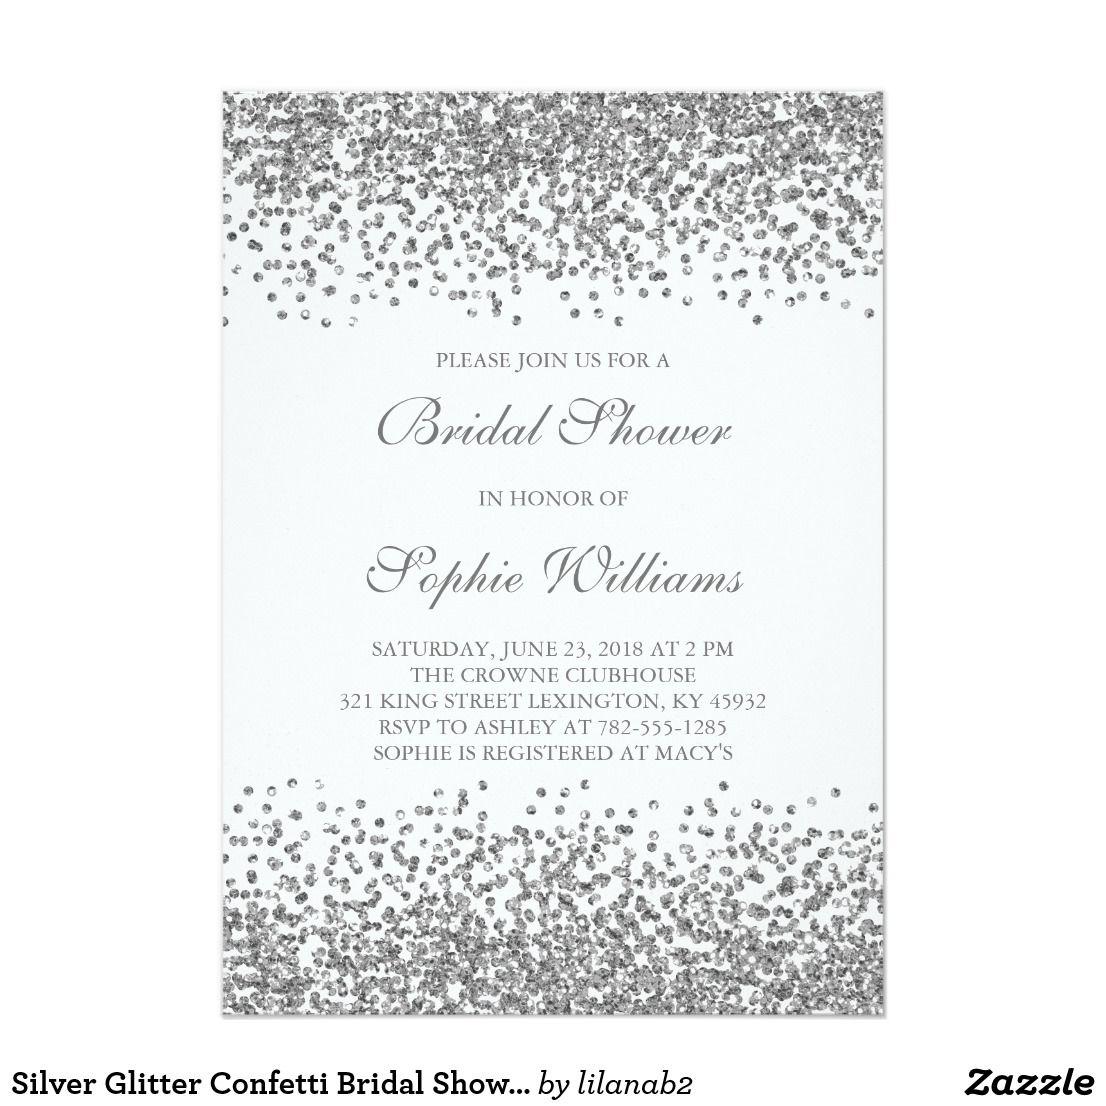 Silver Glitter Confetti Bridal Shower Card This elegant and classy ...